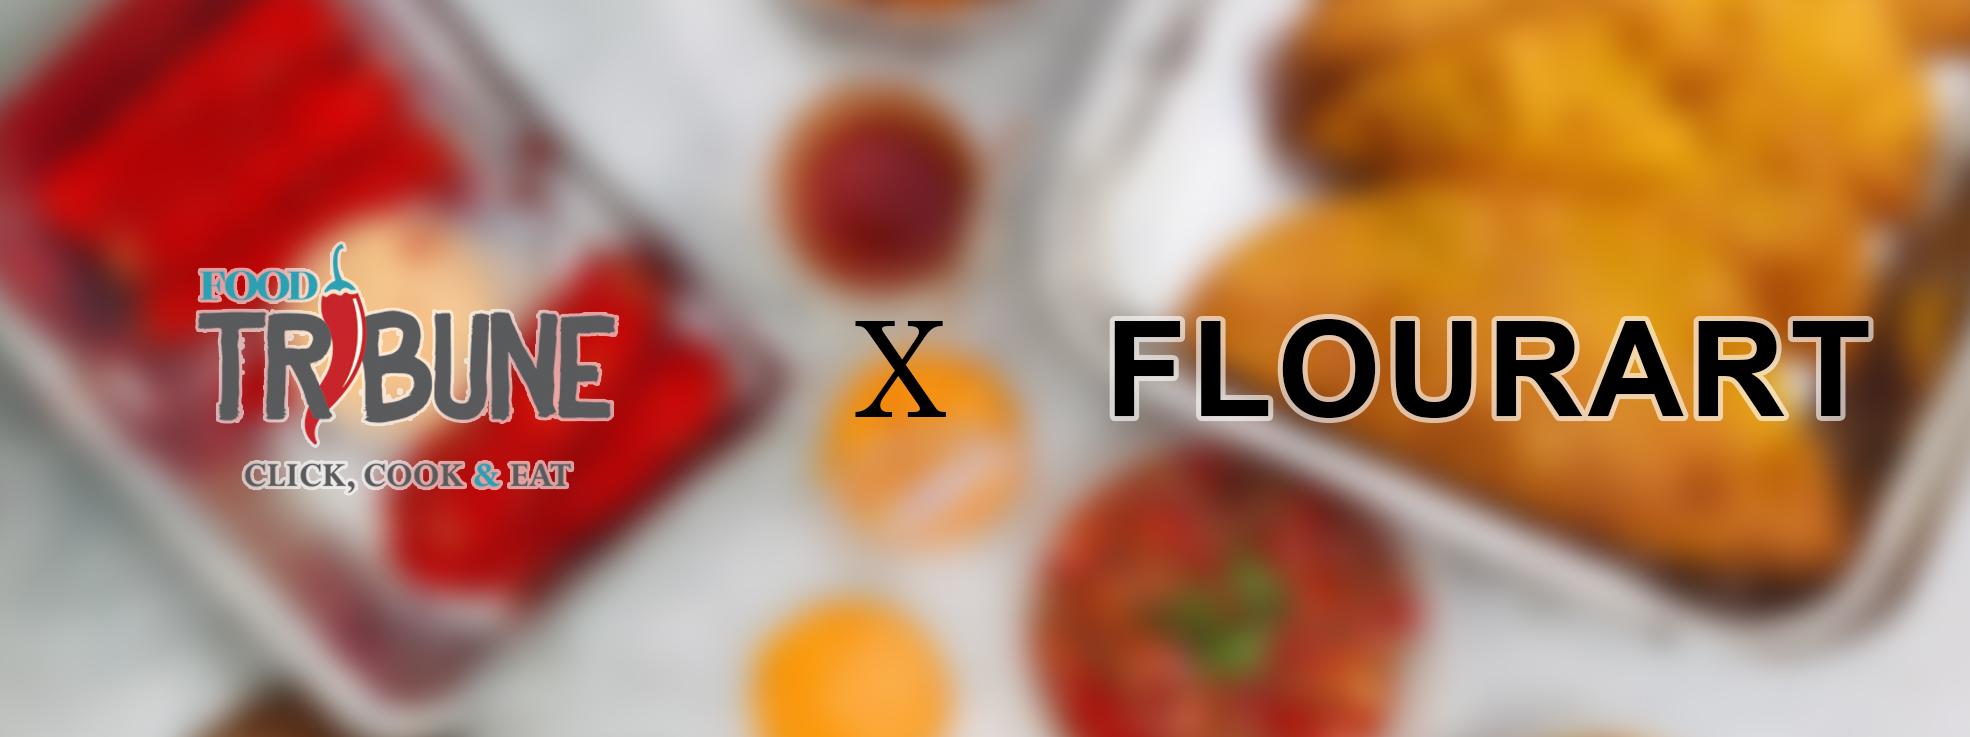 A Journey Of Flourart By Food Tribune